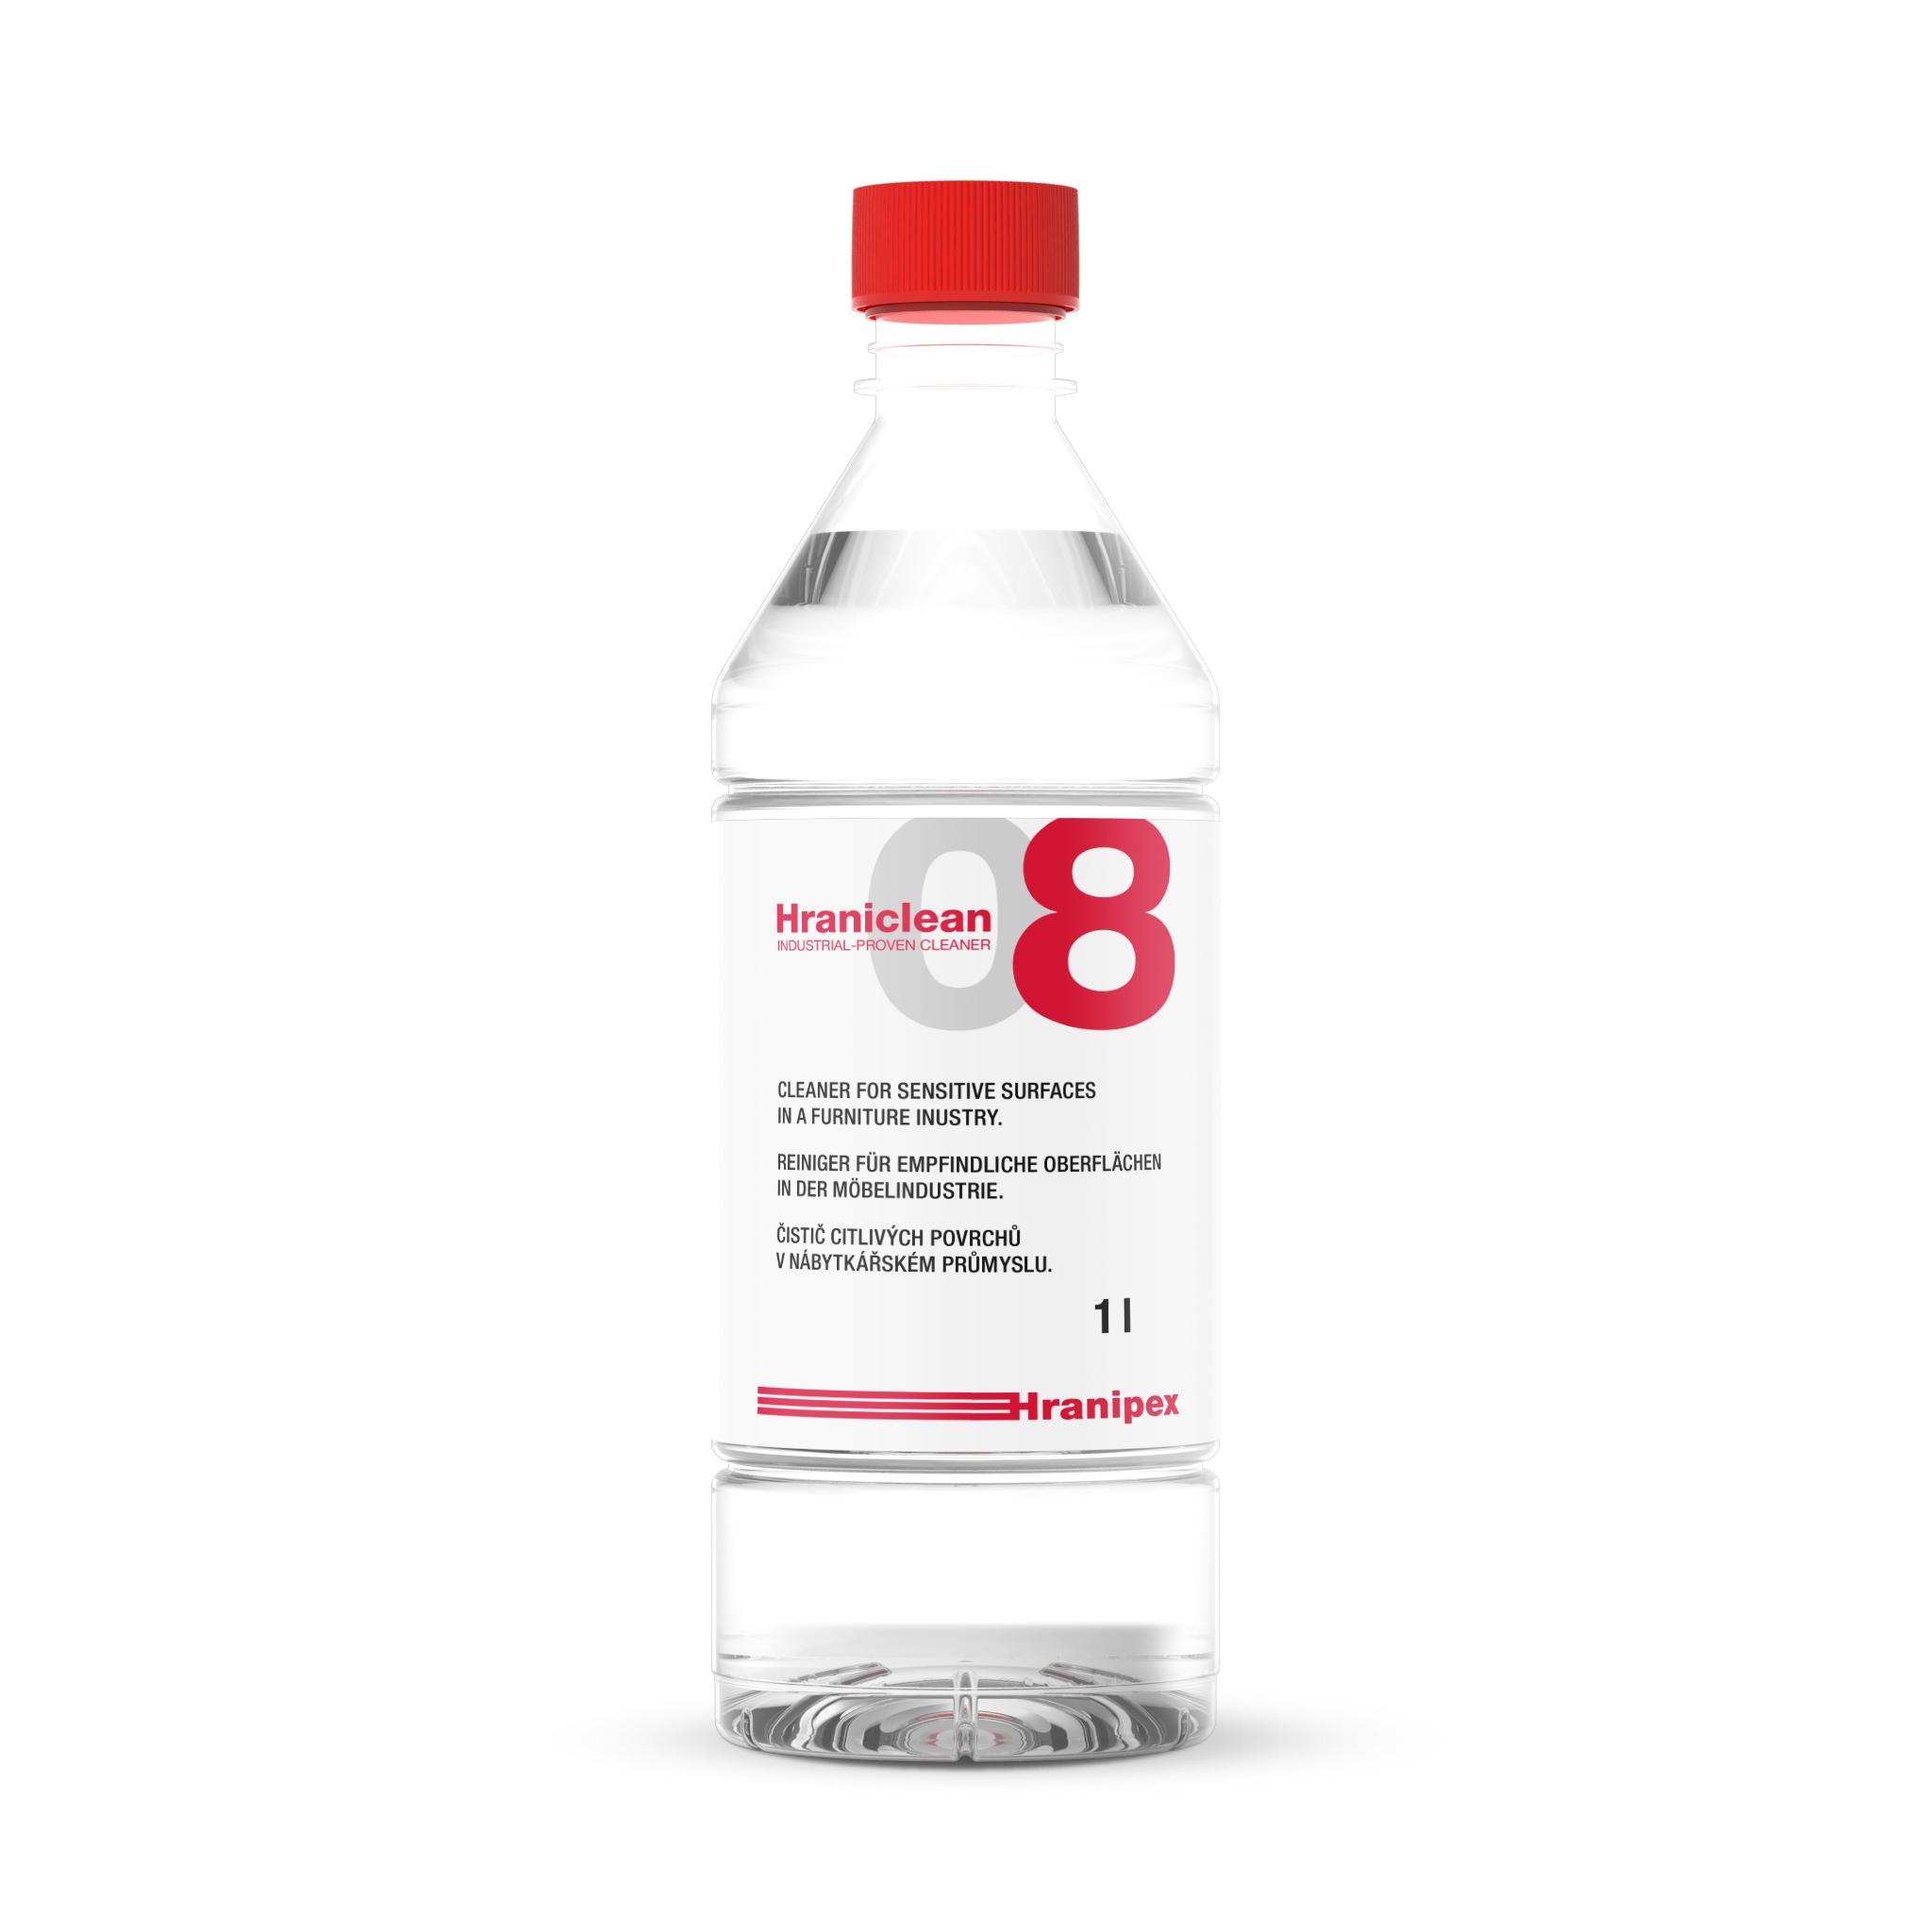 HRANICLEAN 08 Manueller Reiniger für sensible Oberflächen 1 l